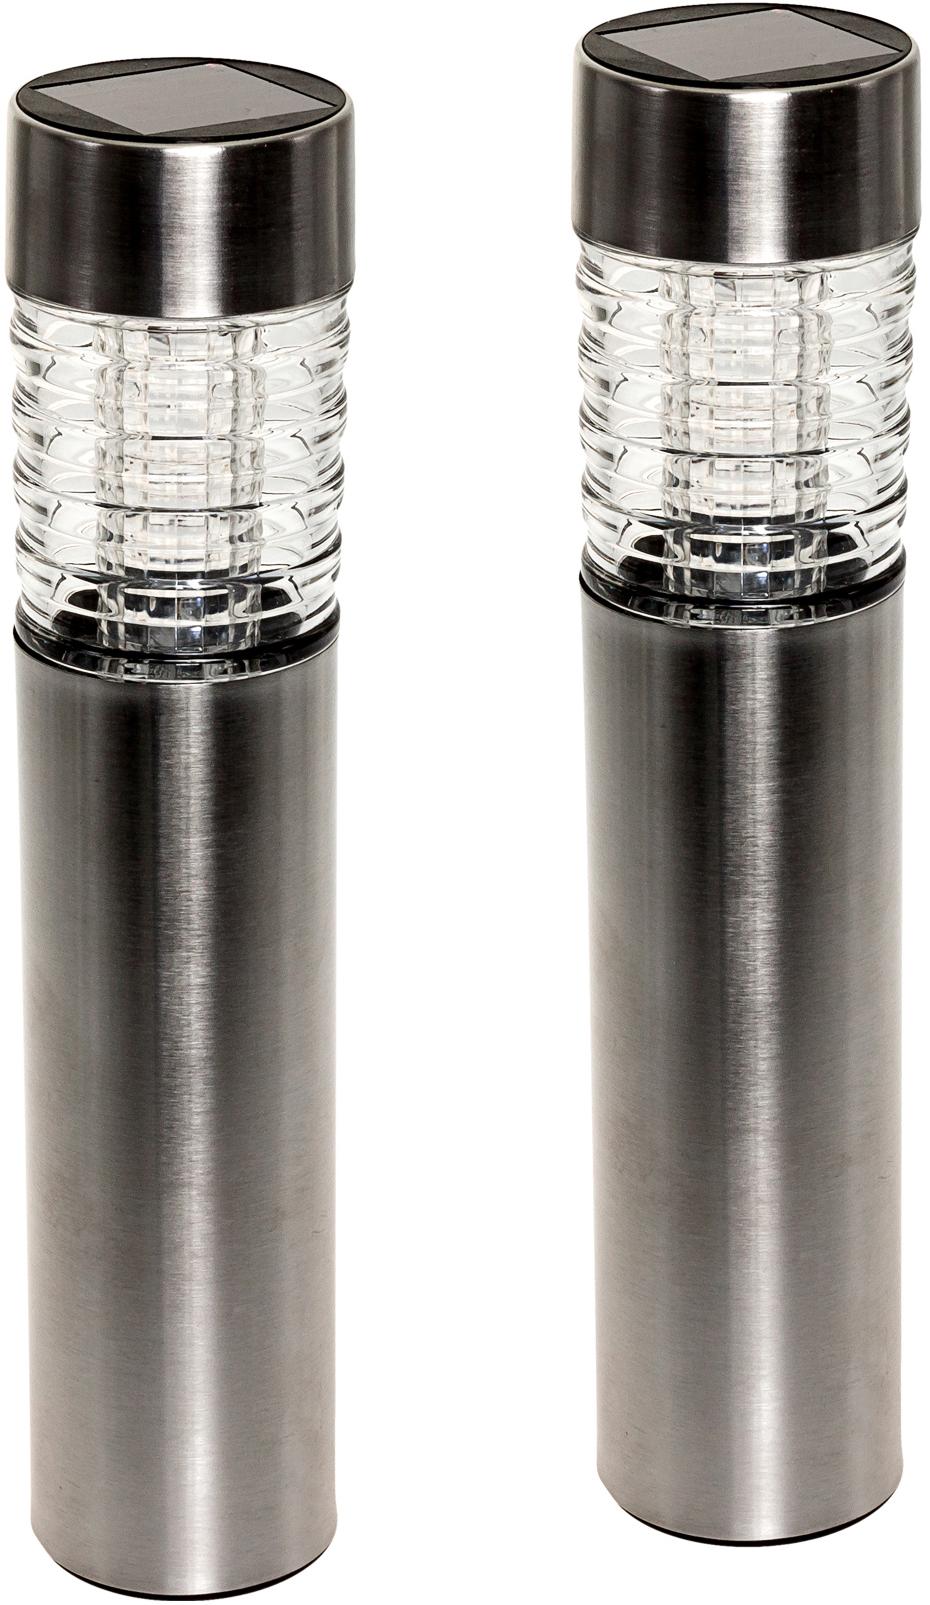 GreenLighting Bollard Path Lights Solar LED Lights Stainless Steel, 12 Pk